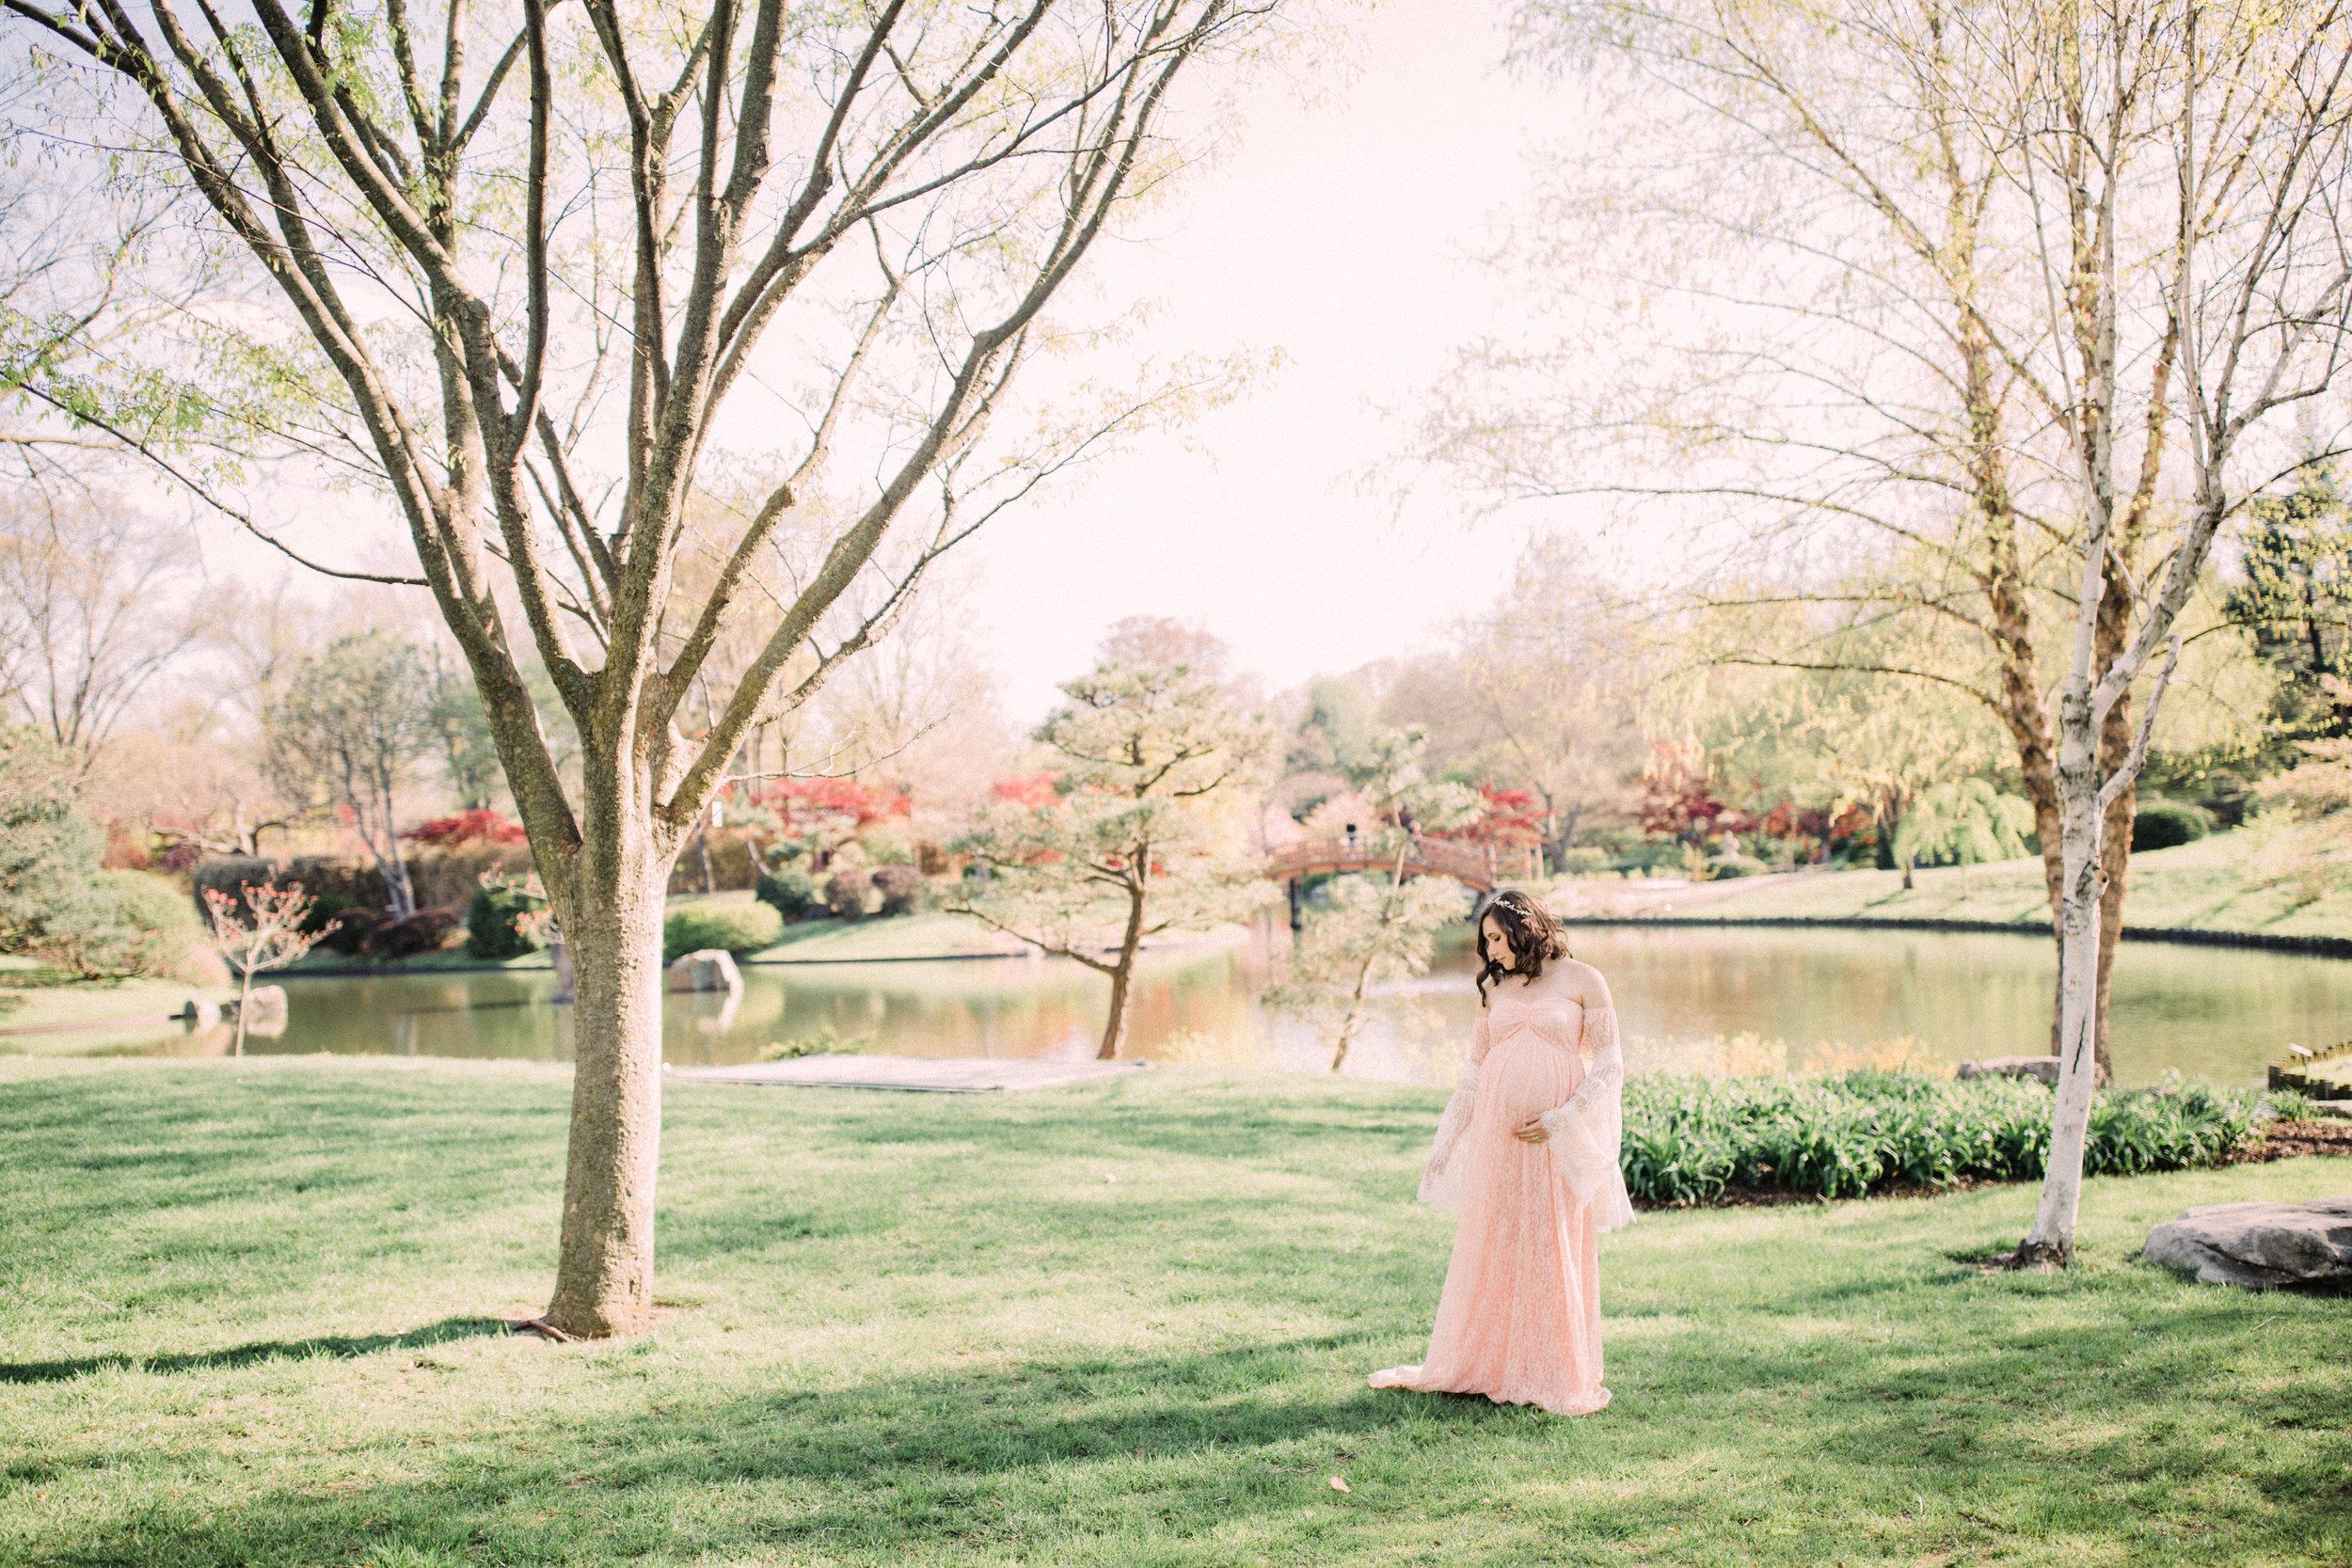 dorothy-louise-photography-Missouri-botanical-garden-maternity-8519.jpg